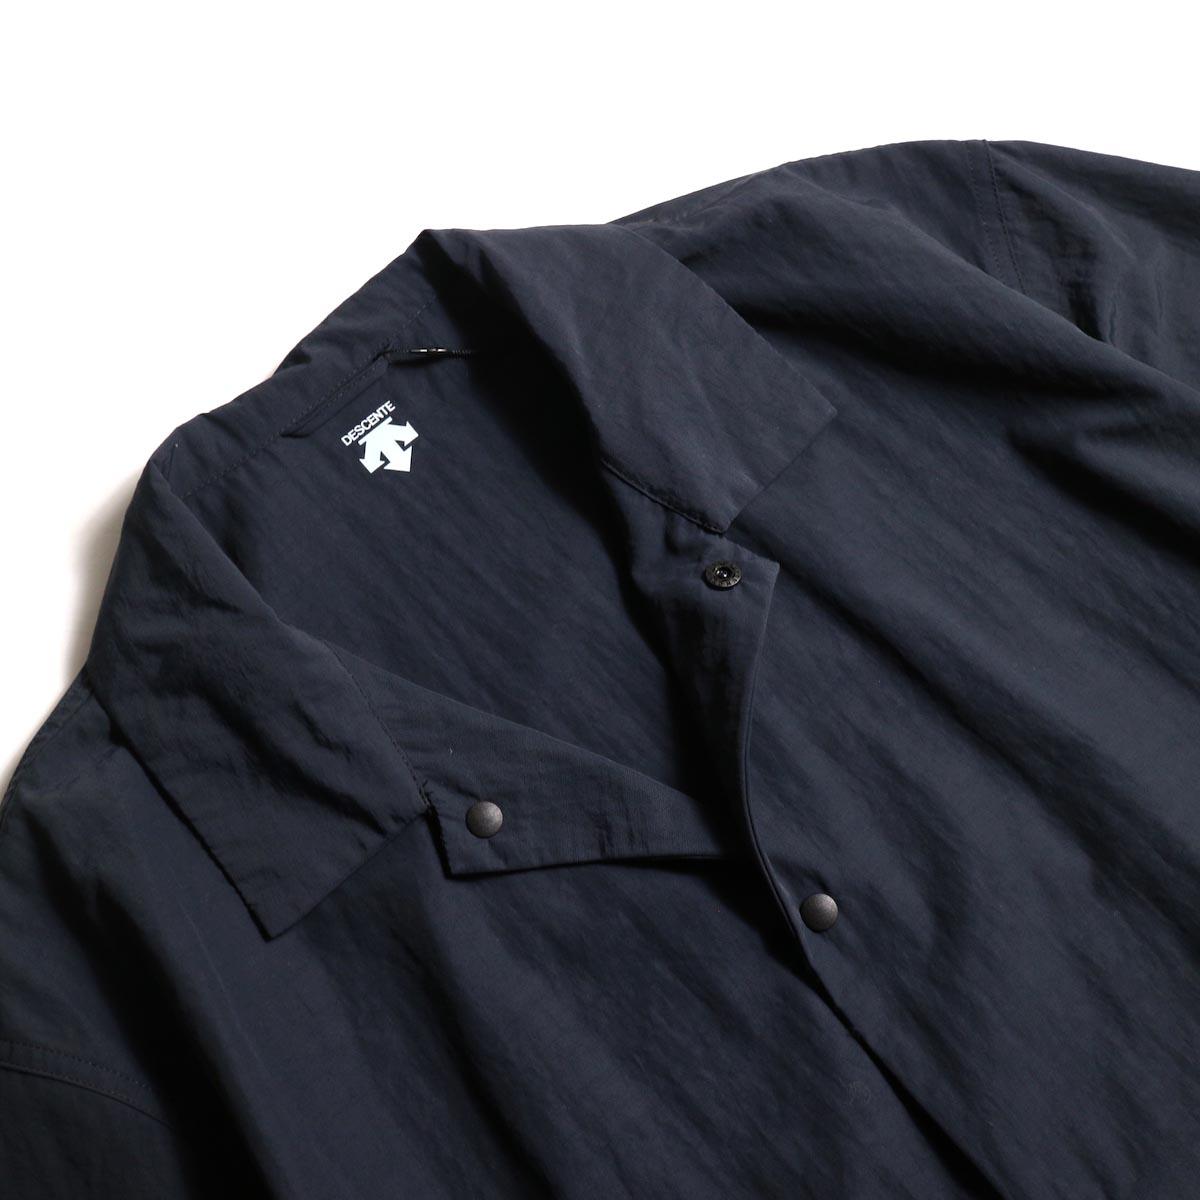 DESCENTE ddd / COACH SHIRT (Black)襟周り